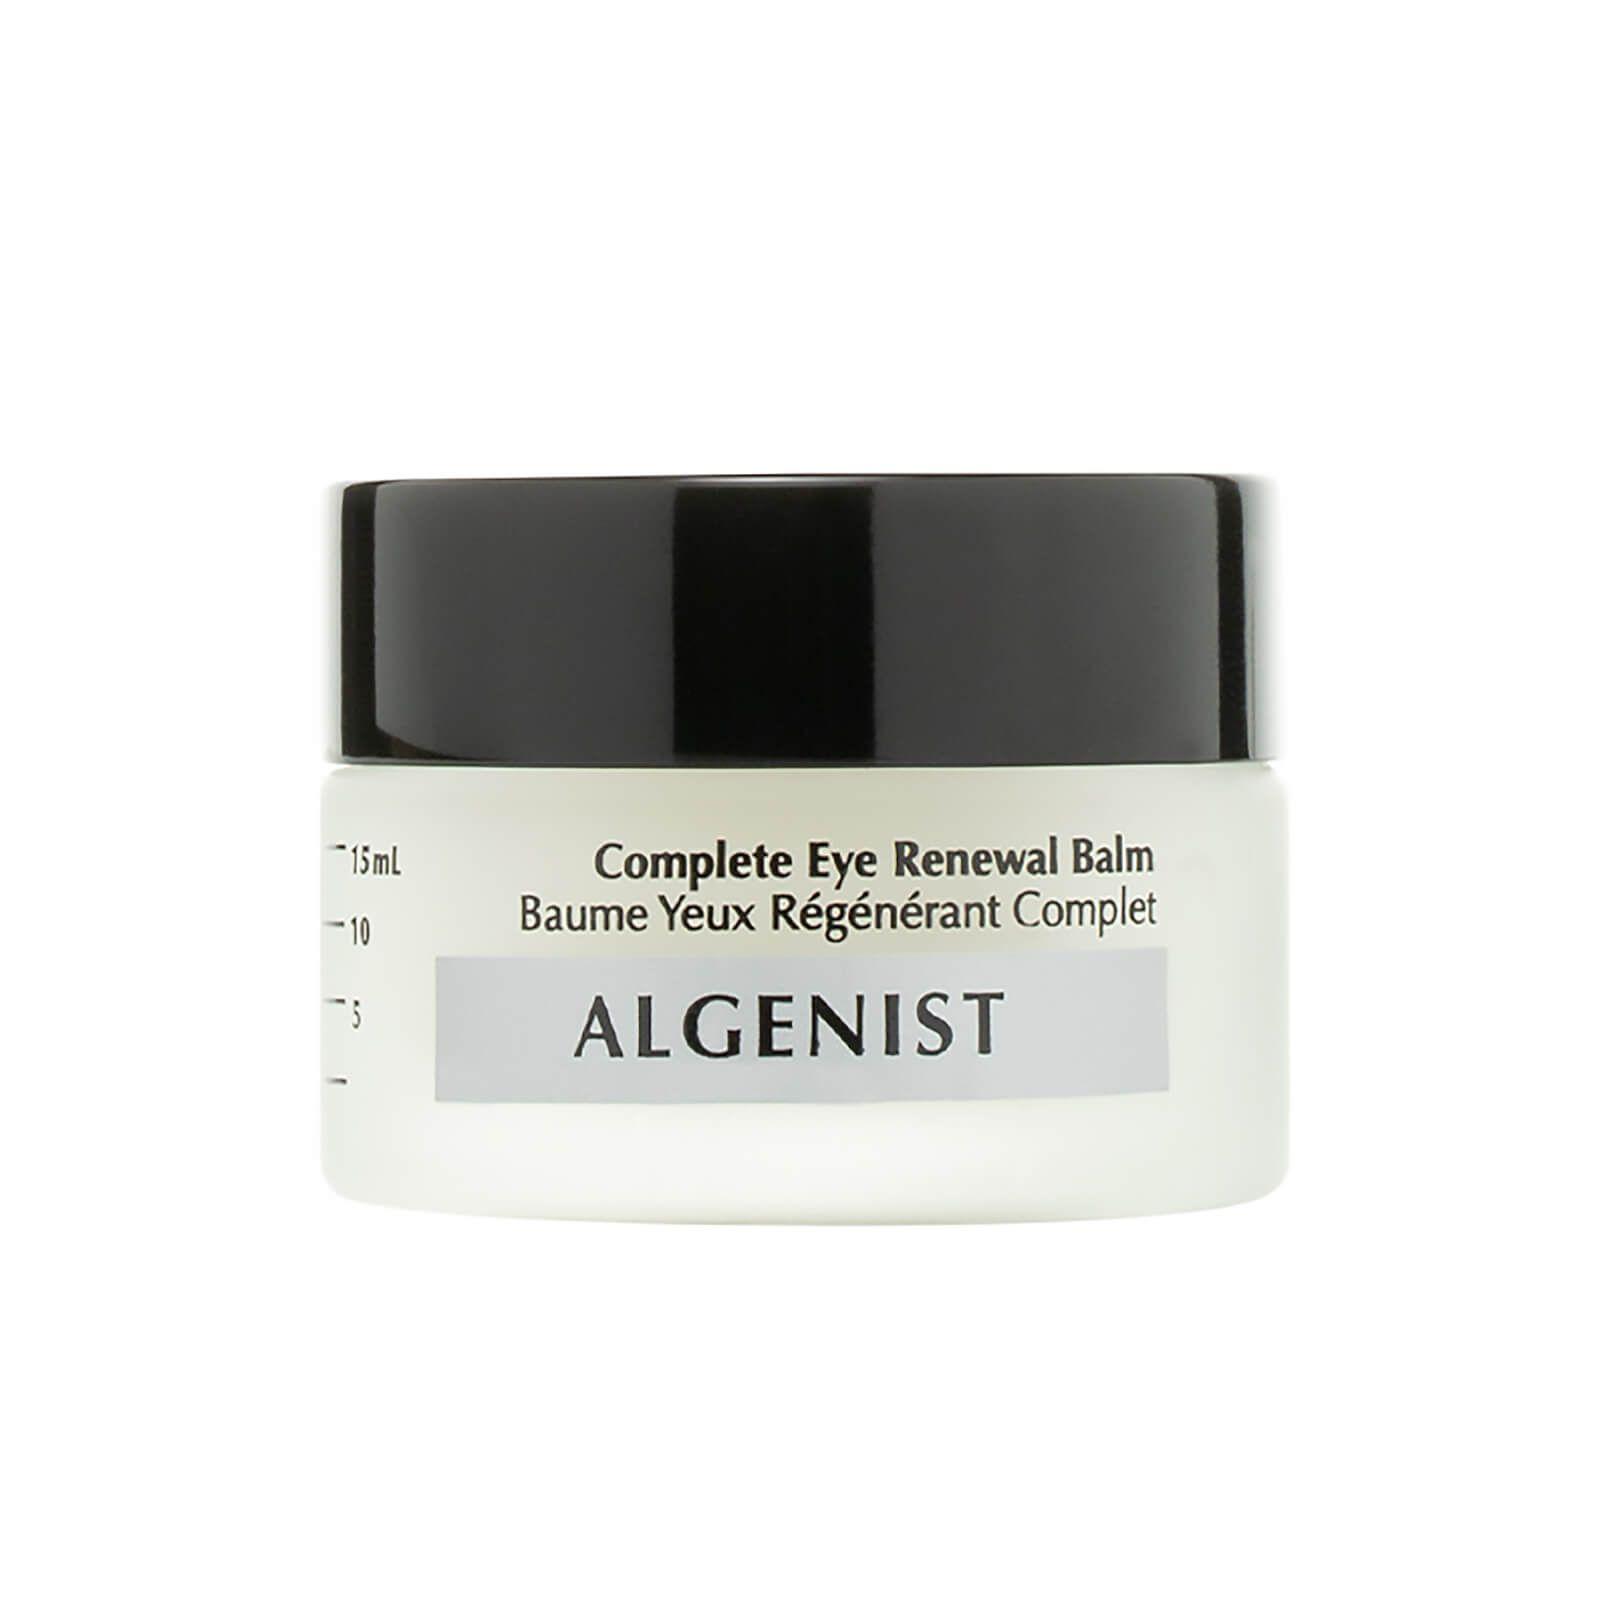 Algenist Complete Eye Renewal Balm